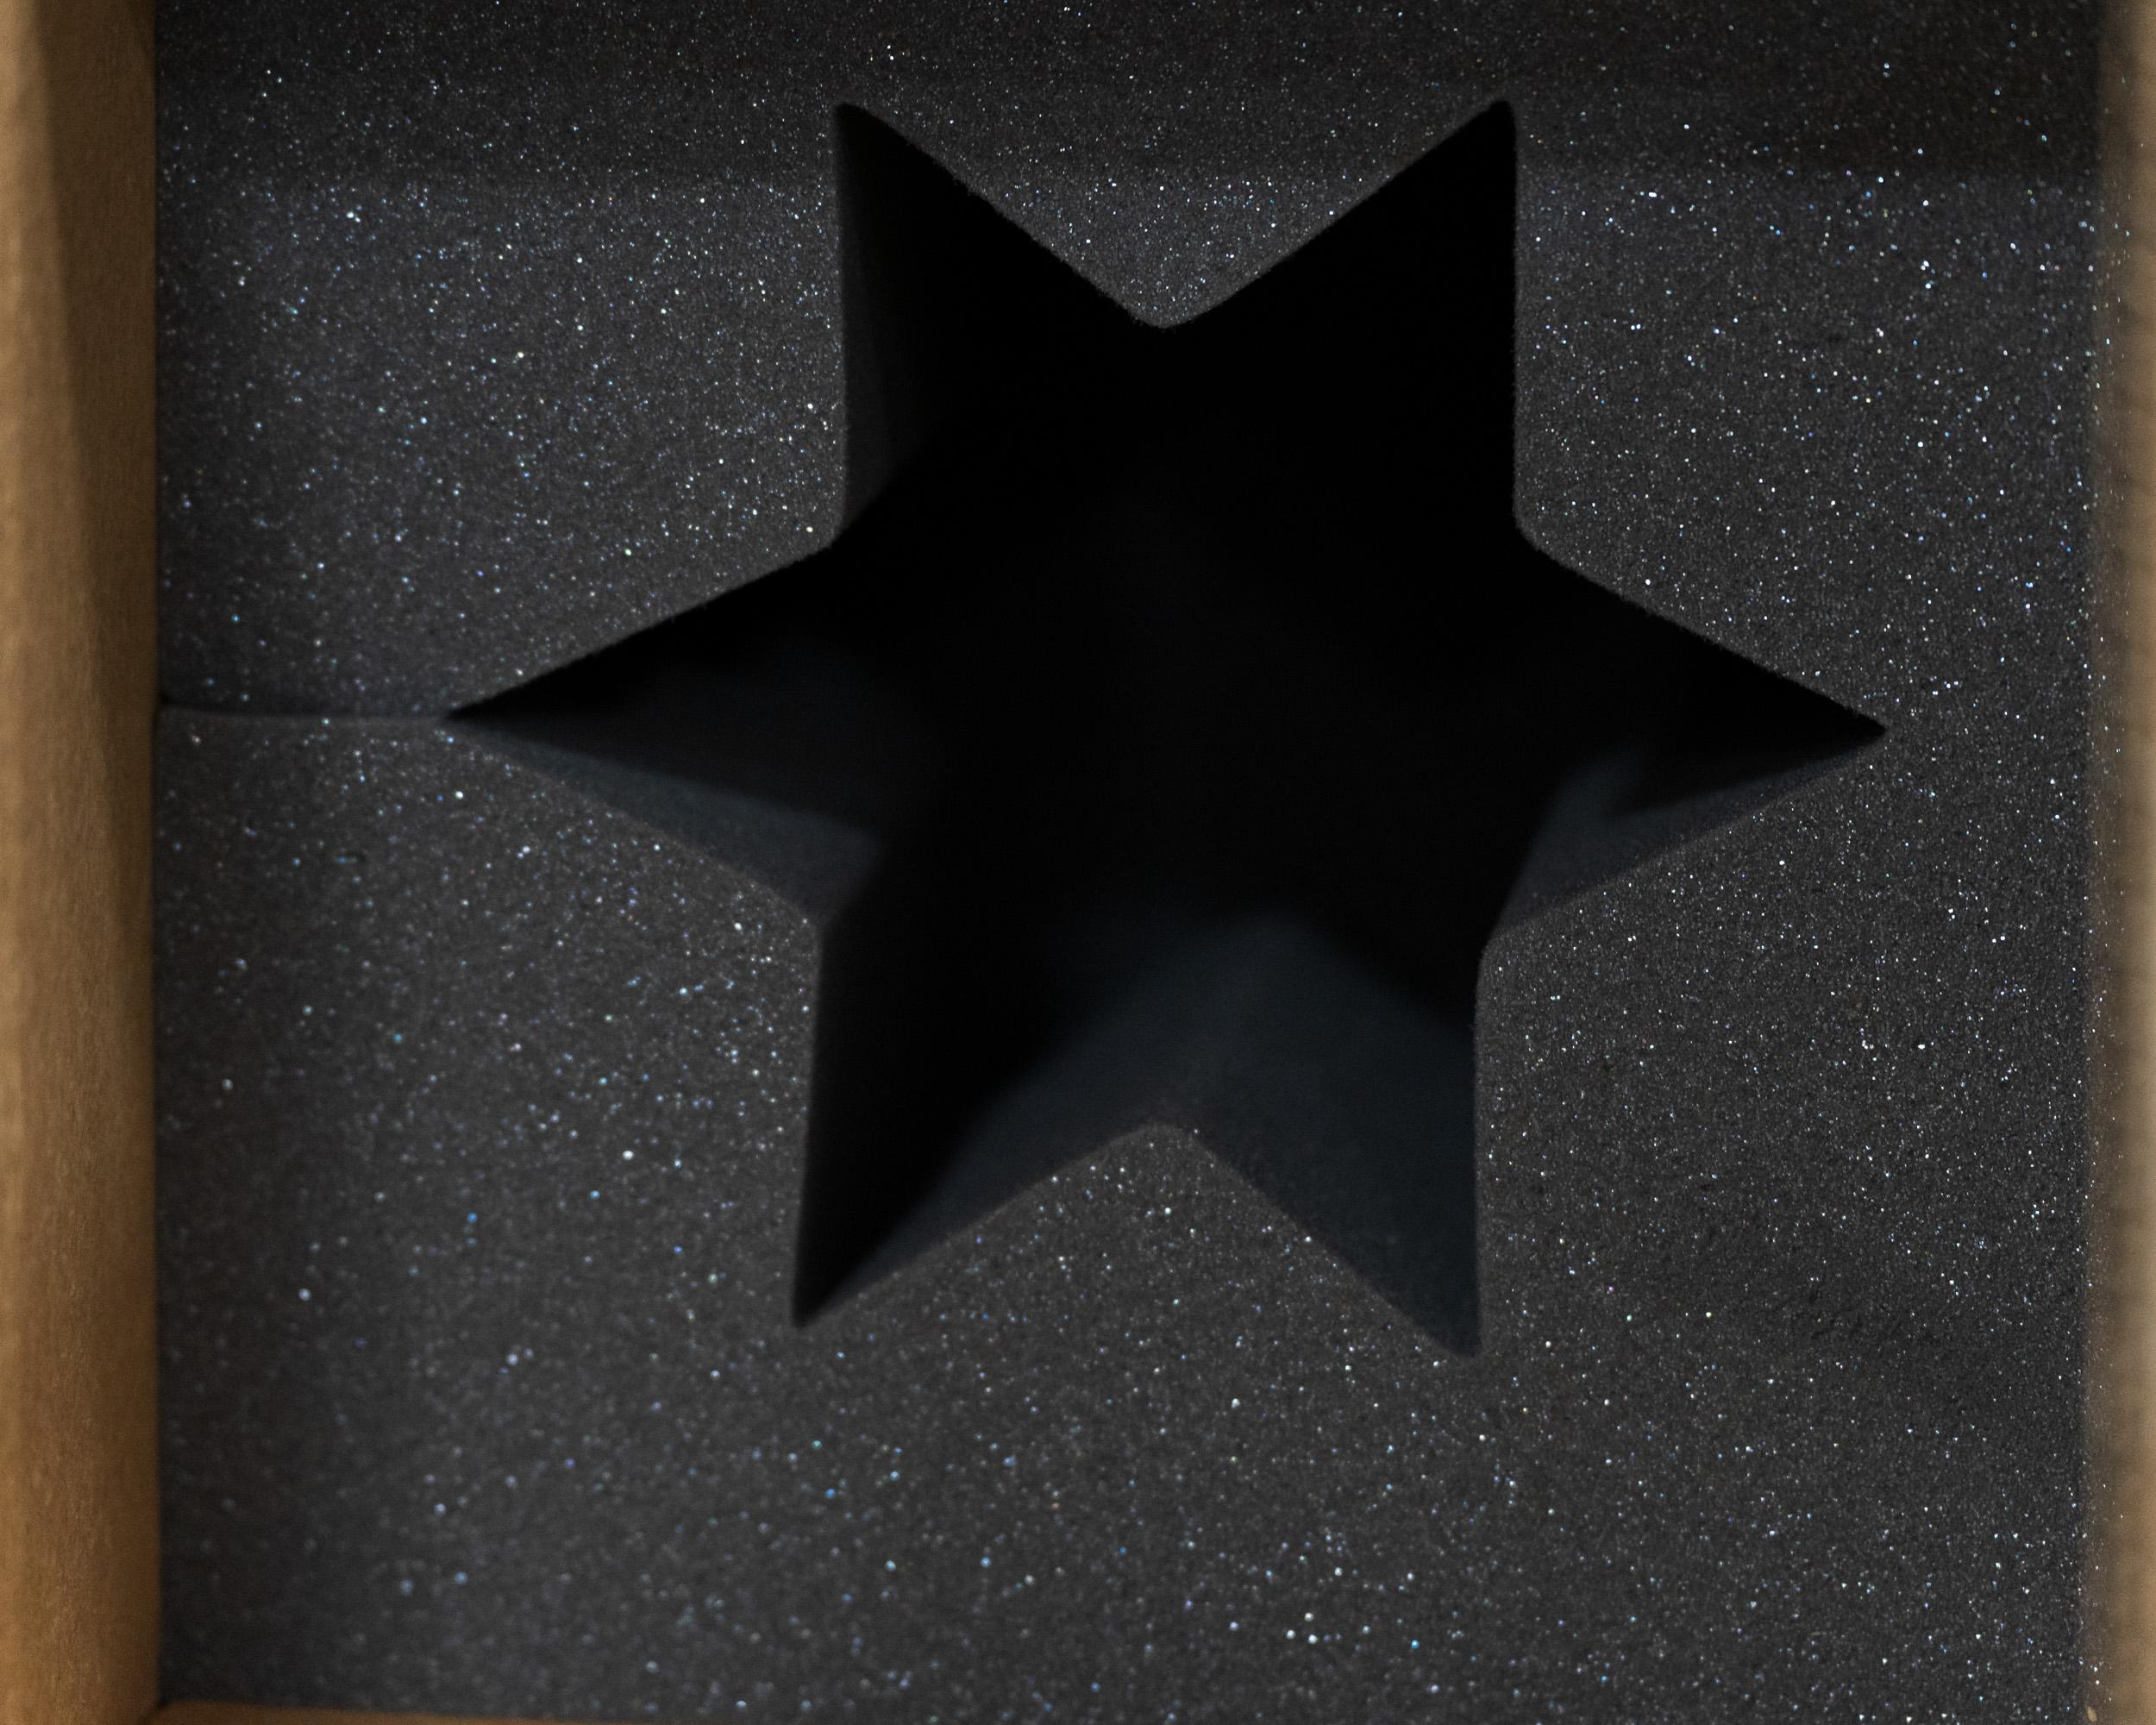 A foam pad with a star design